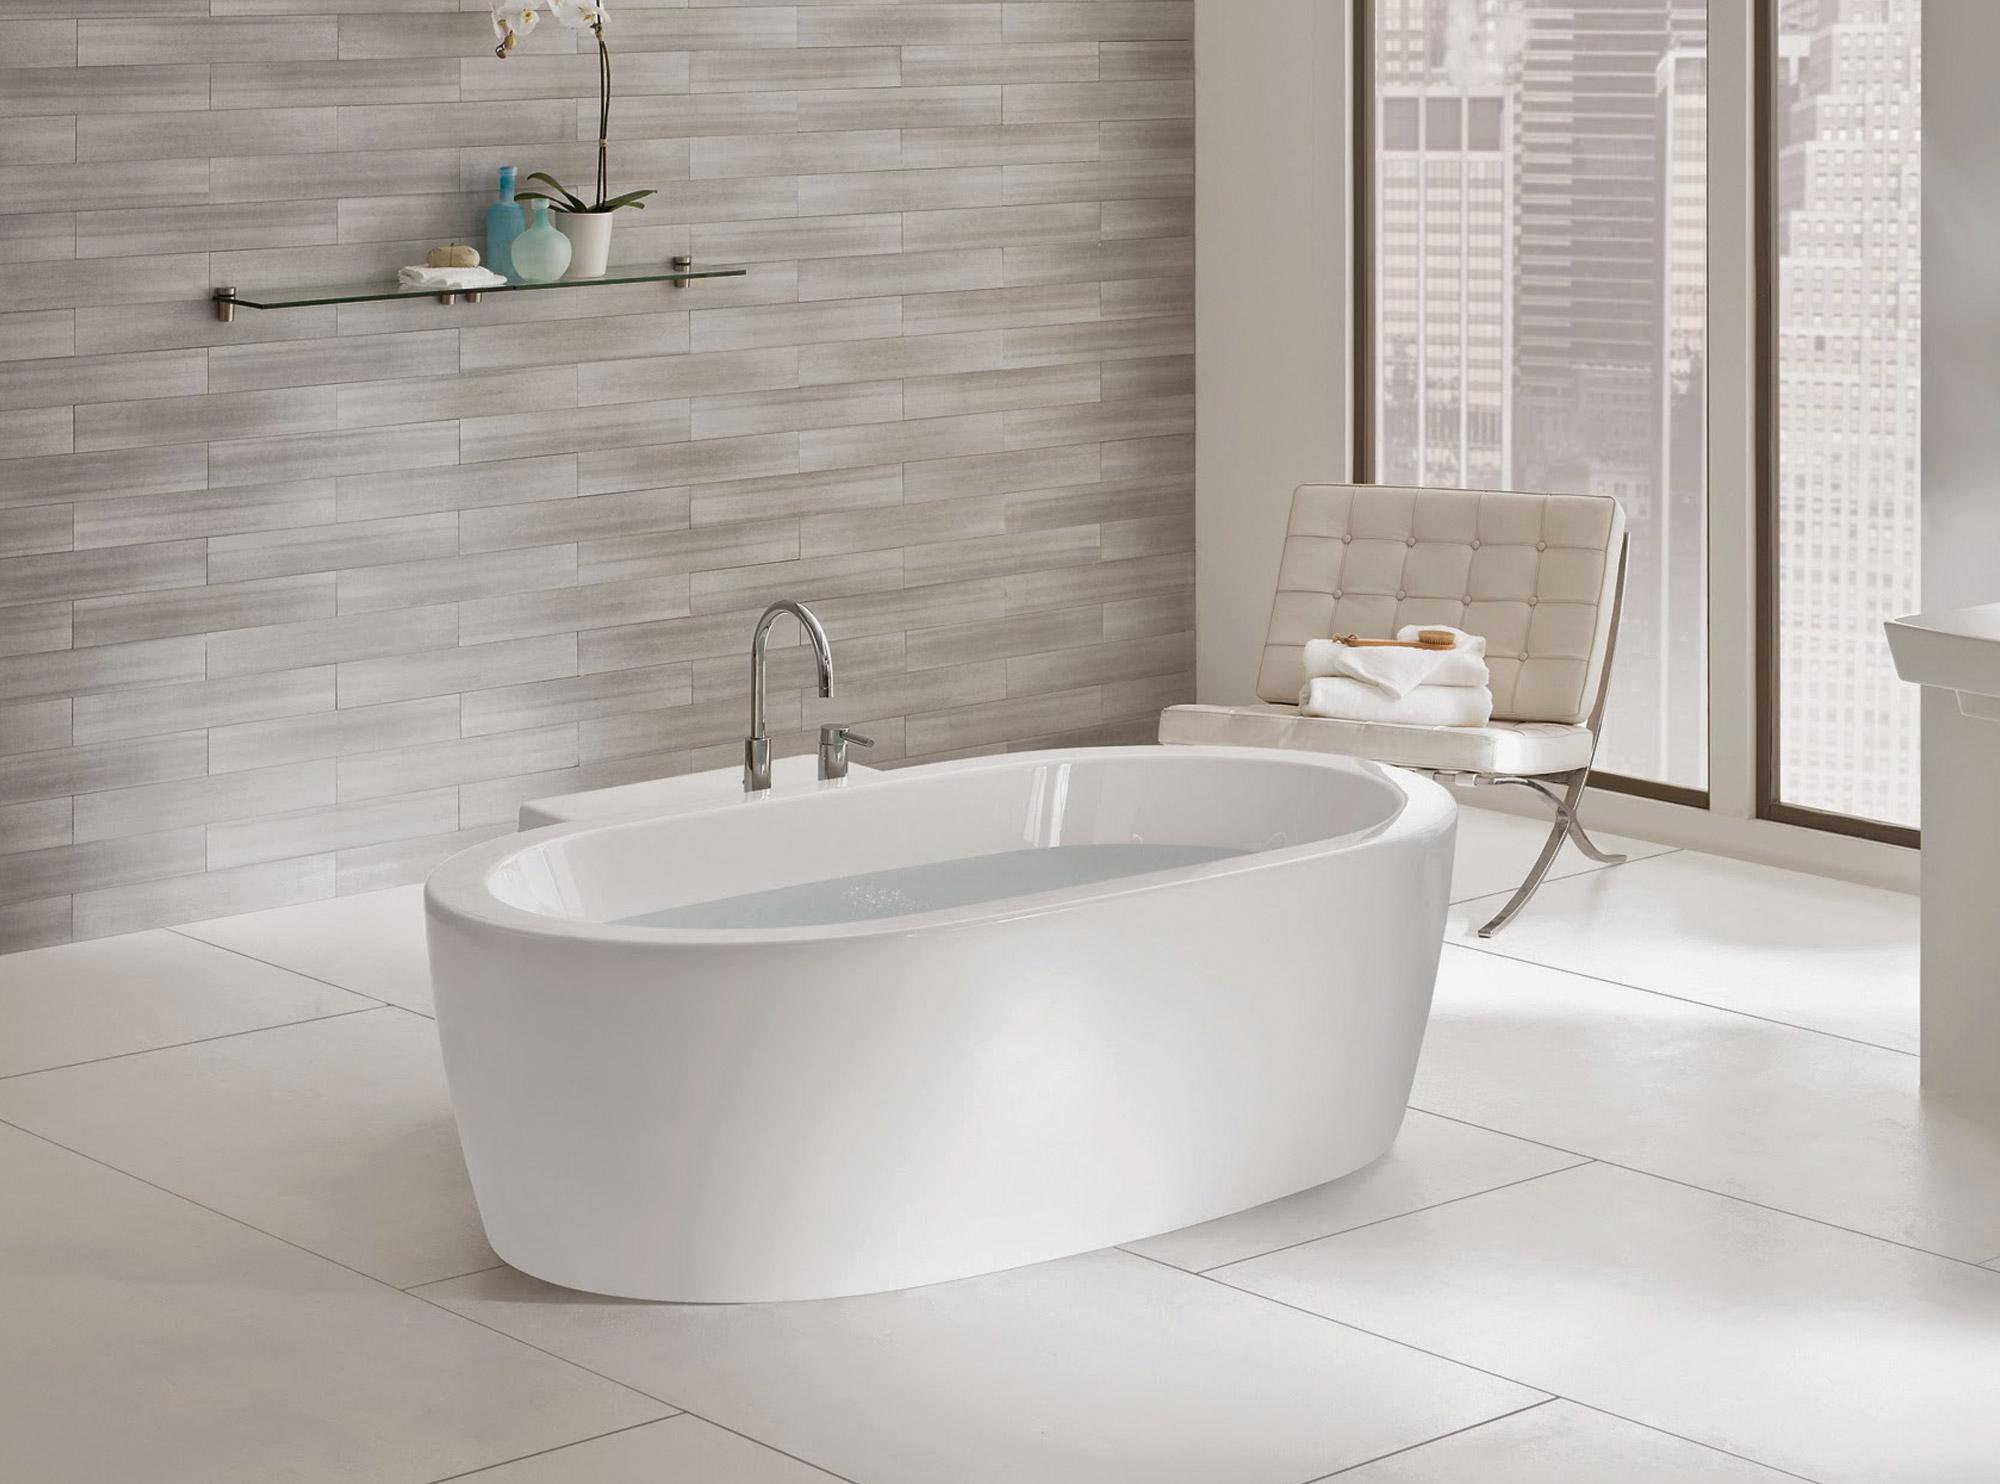 Bathroom Faucets Kansas City kansas city plumbing fixtures, faucets, water heaters in johnson